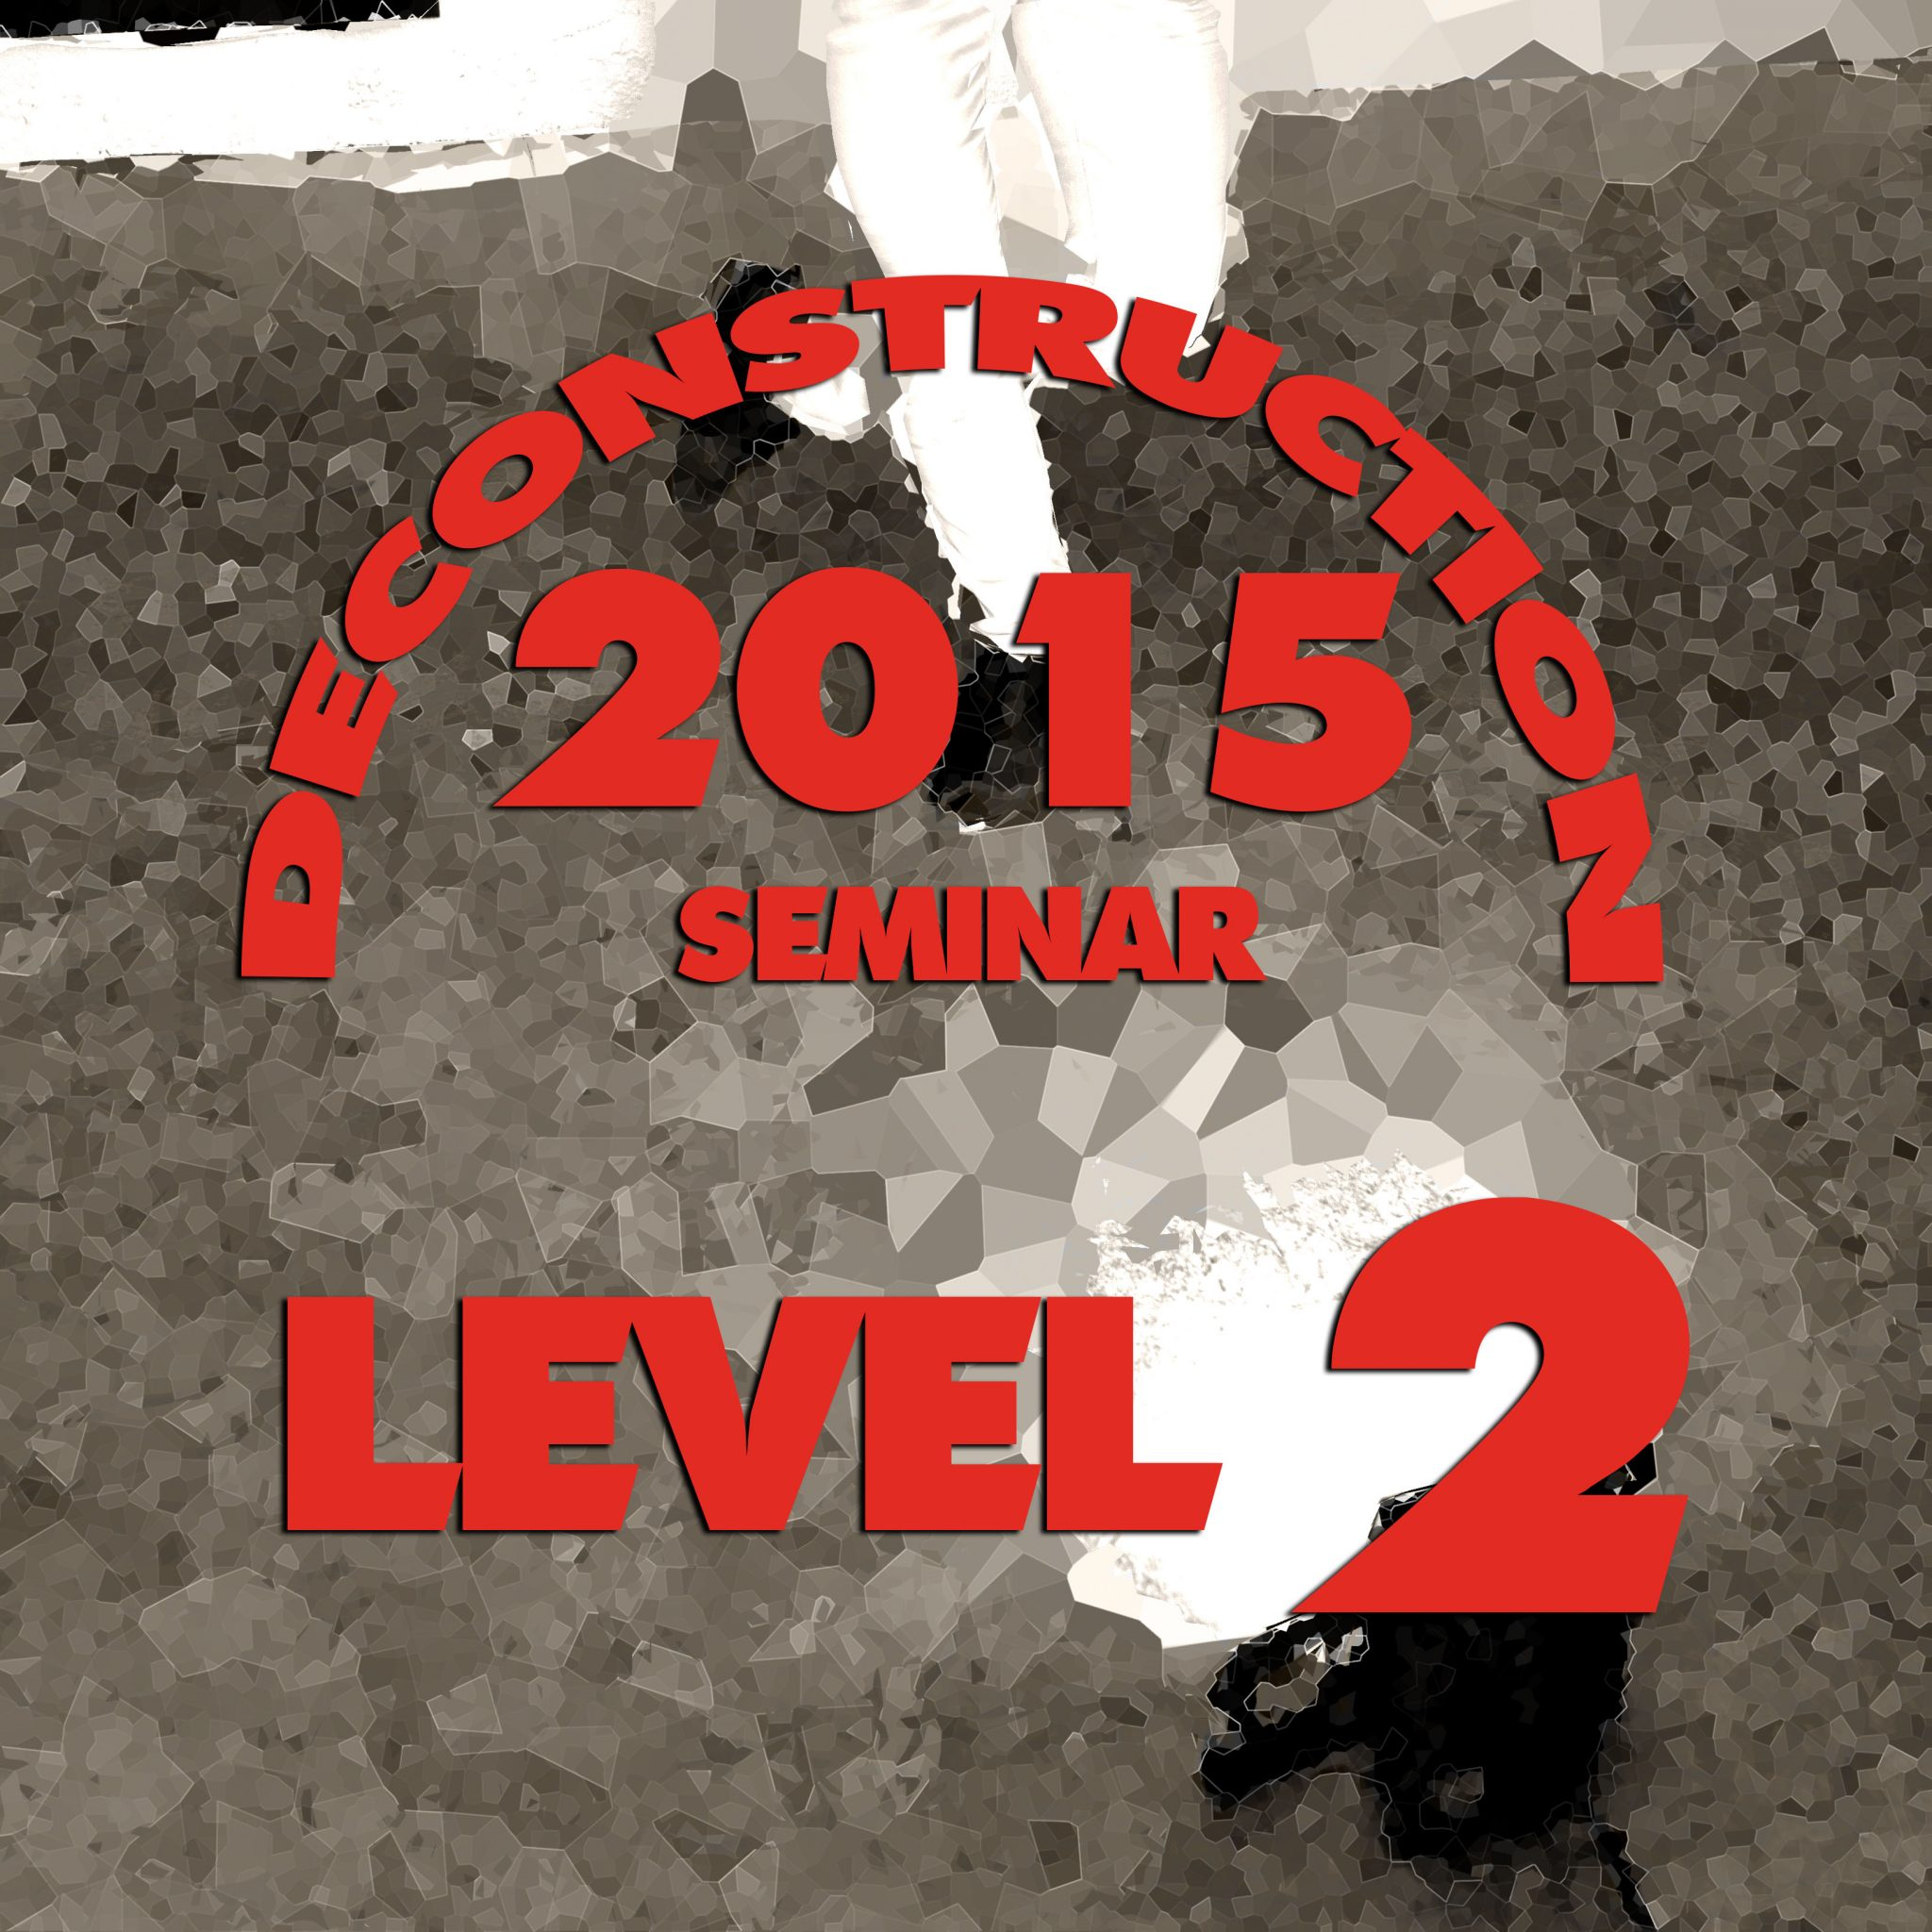 Seminar Level 2